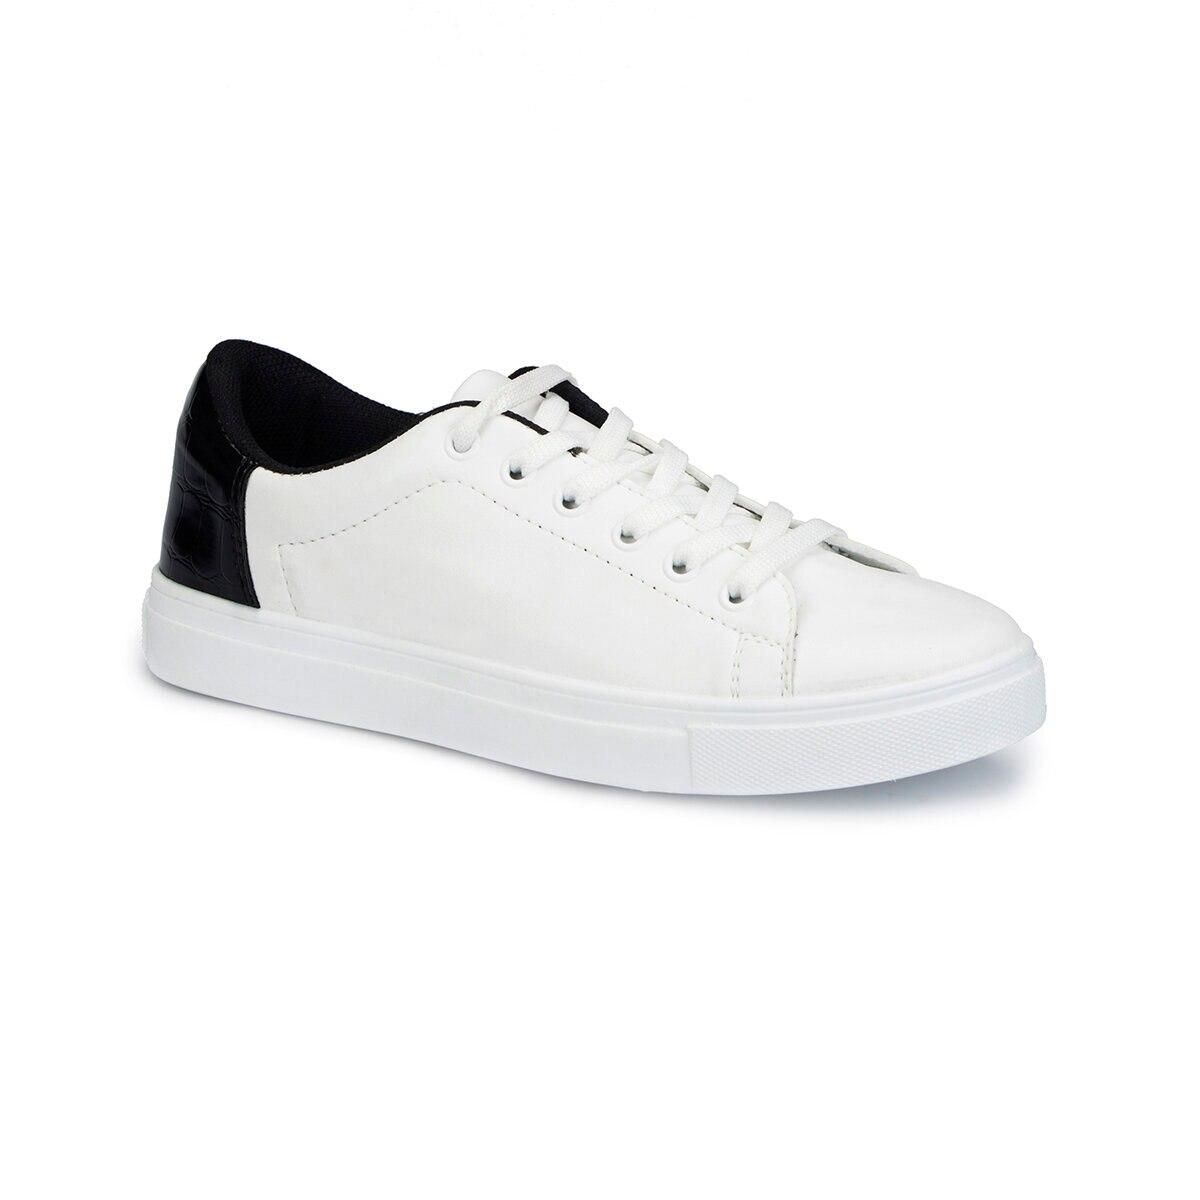 FLO 81. 311667.Z Navy Blue Women 'S Sneaker Shoes Polaris